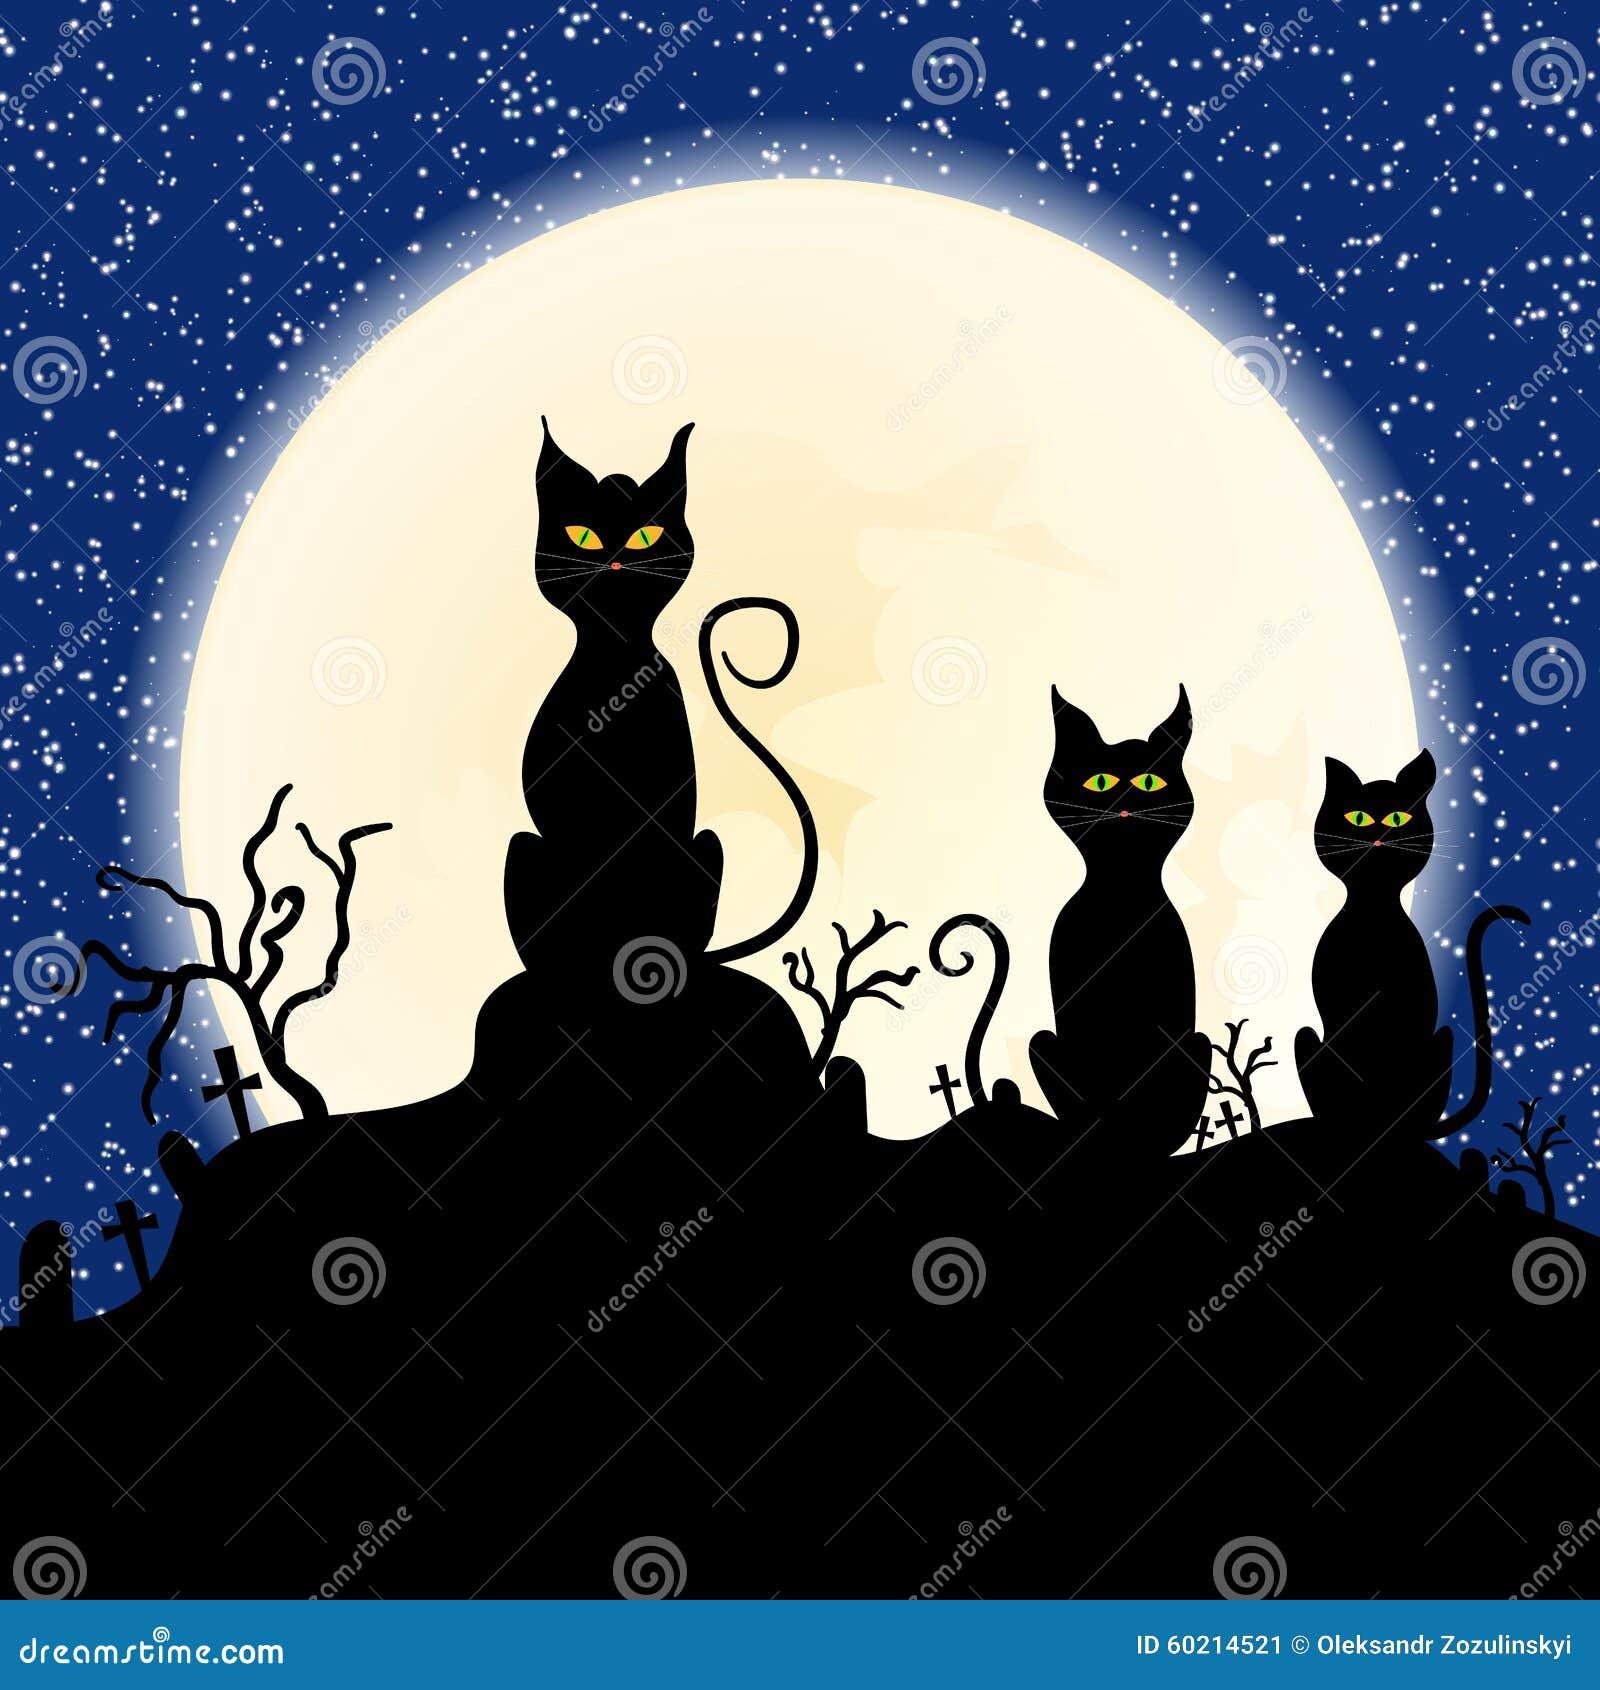 Black Cat Chimney